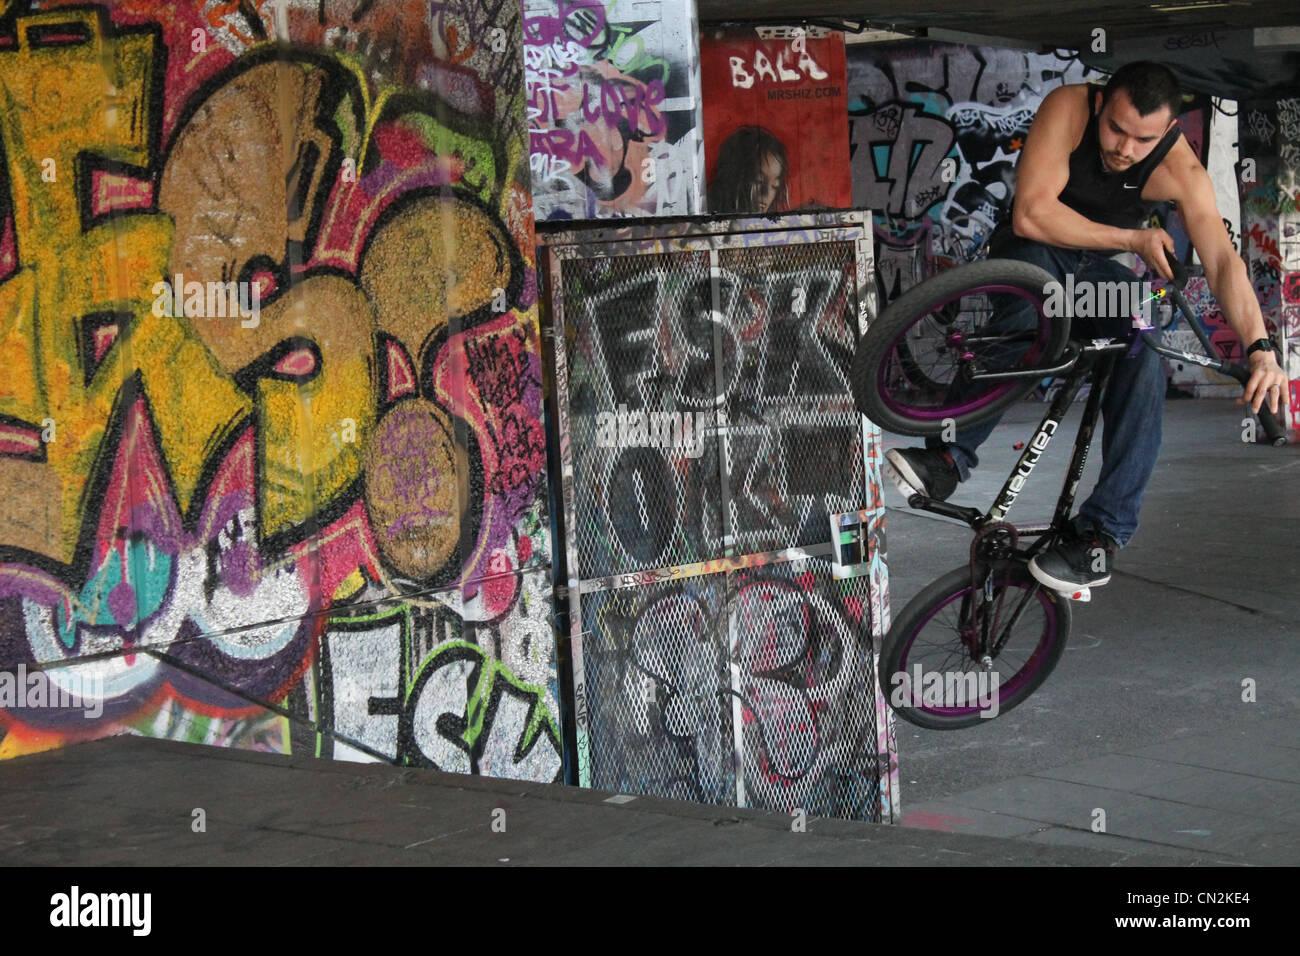 bmx rider, bmx tricks, bmx stunts, bike tricks - Stock Image